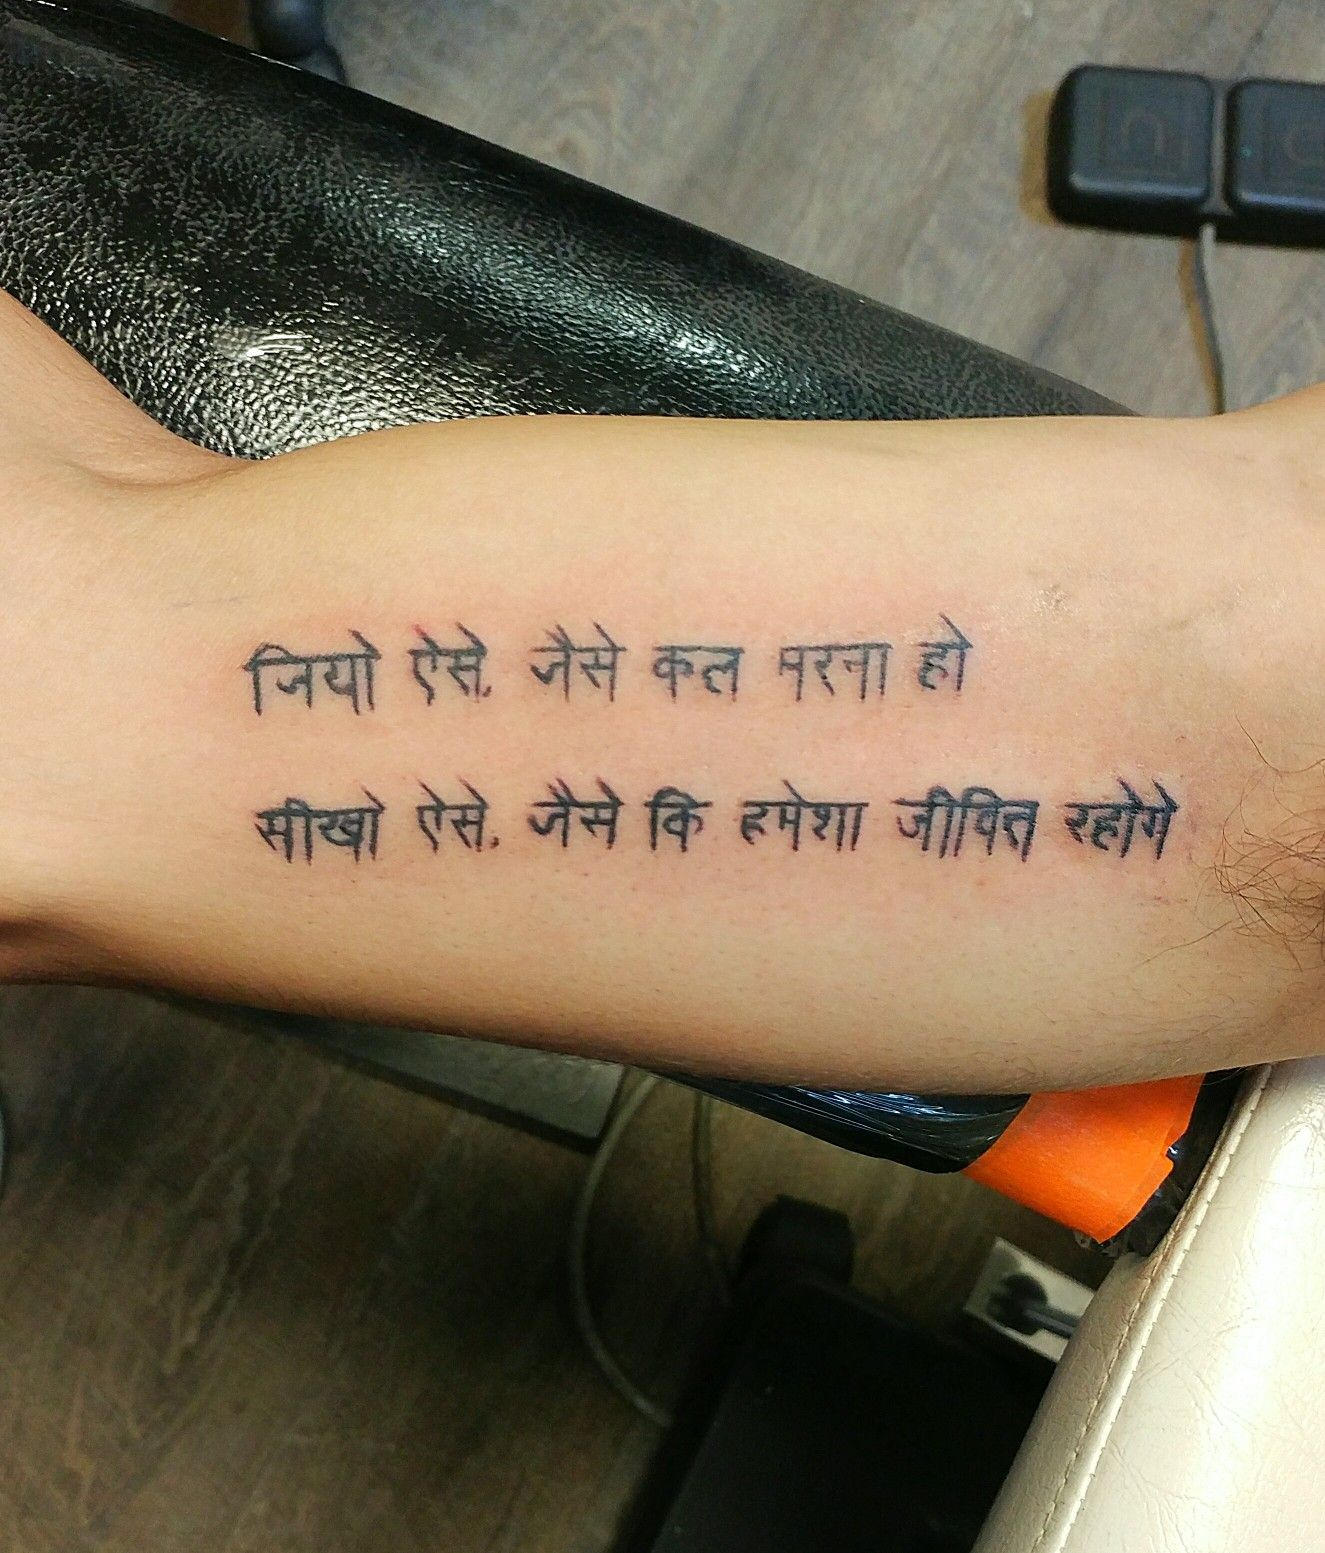 Tattoo Quotes Hindi: Hindi Quote Tattoo